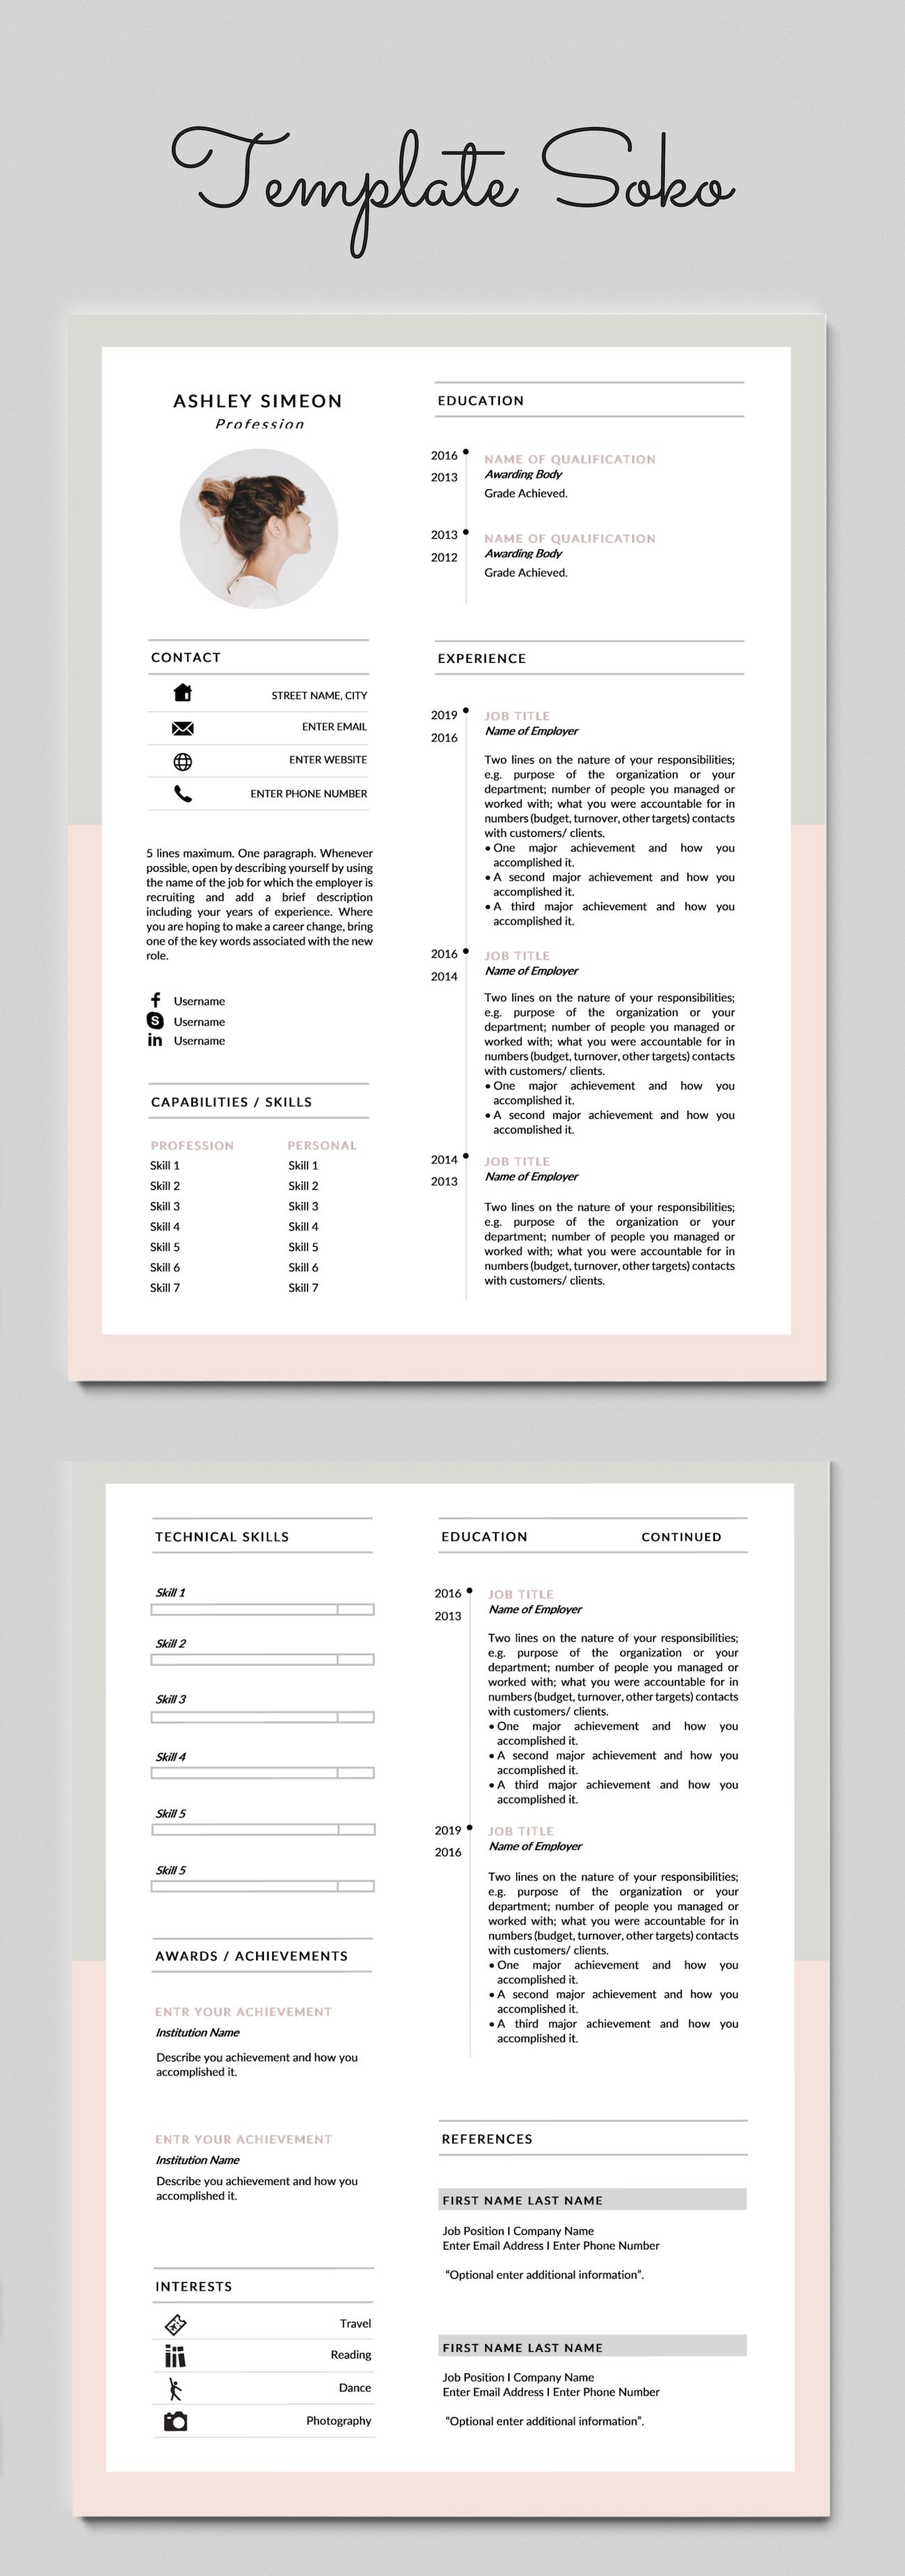 Cv Design Resume Template Word Cv Template Curriculum Etsy Modele De Cv Creatif Design Cv Creatif Curriculum Vitae